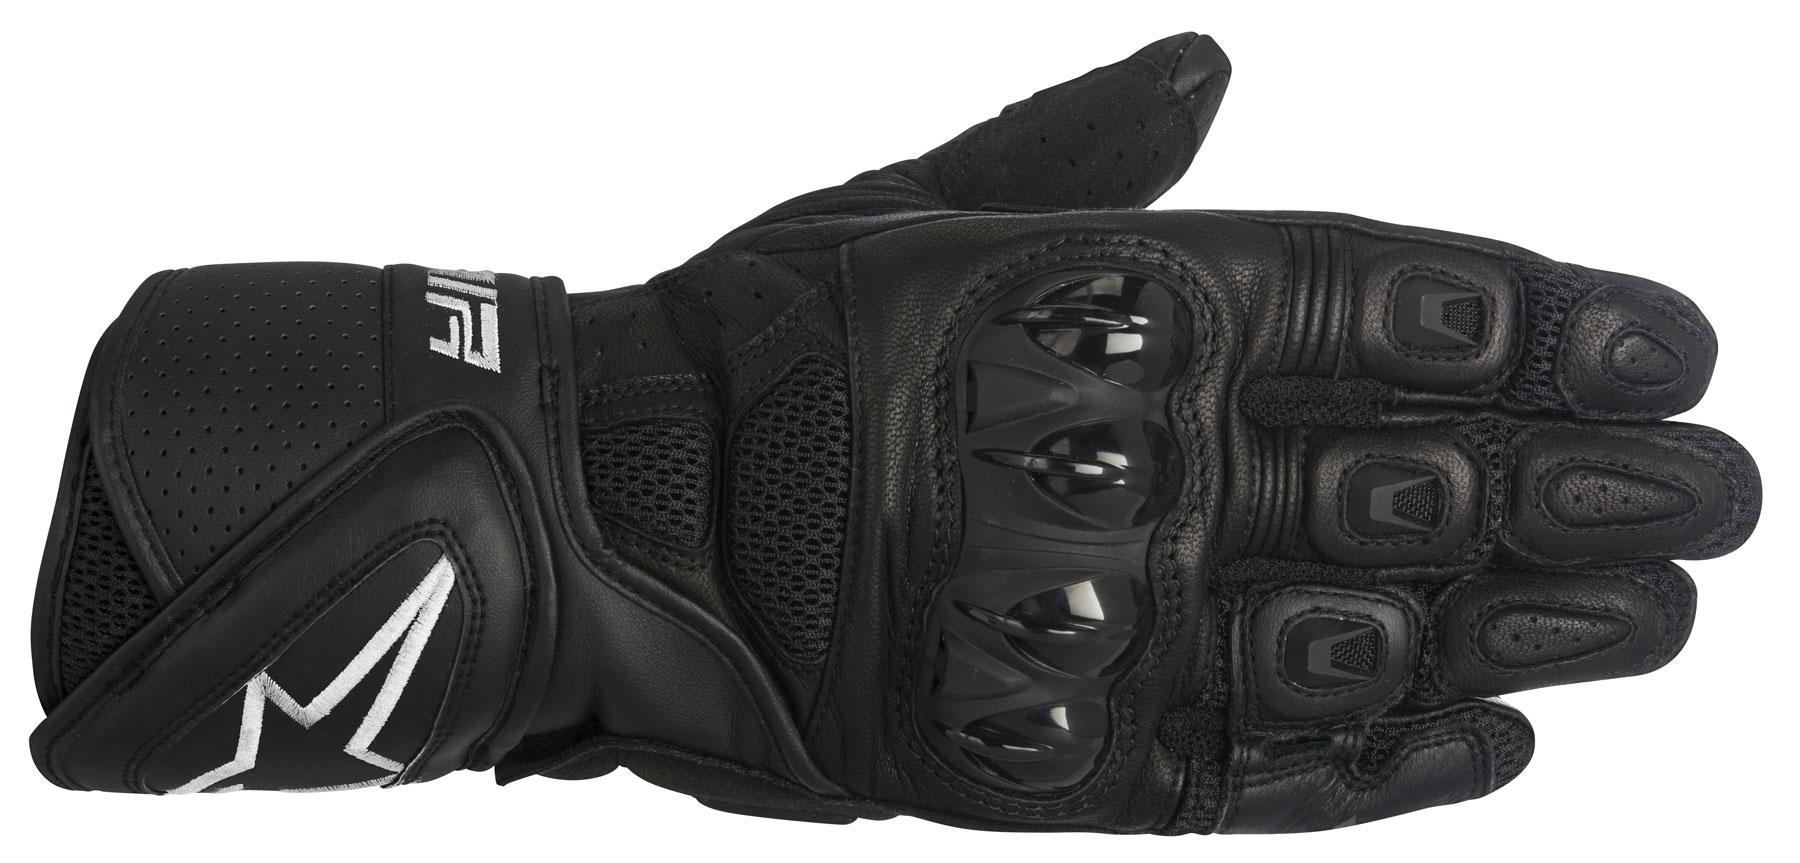 Alpinestars Stella SP AIR Leather/Mesh Gloves (Black)